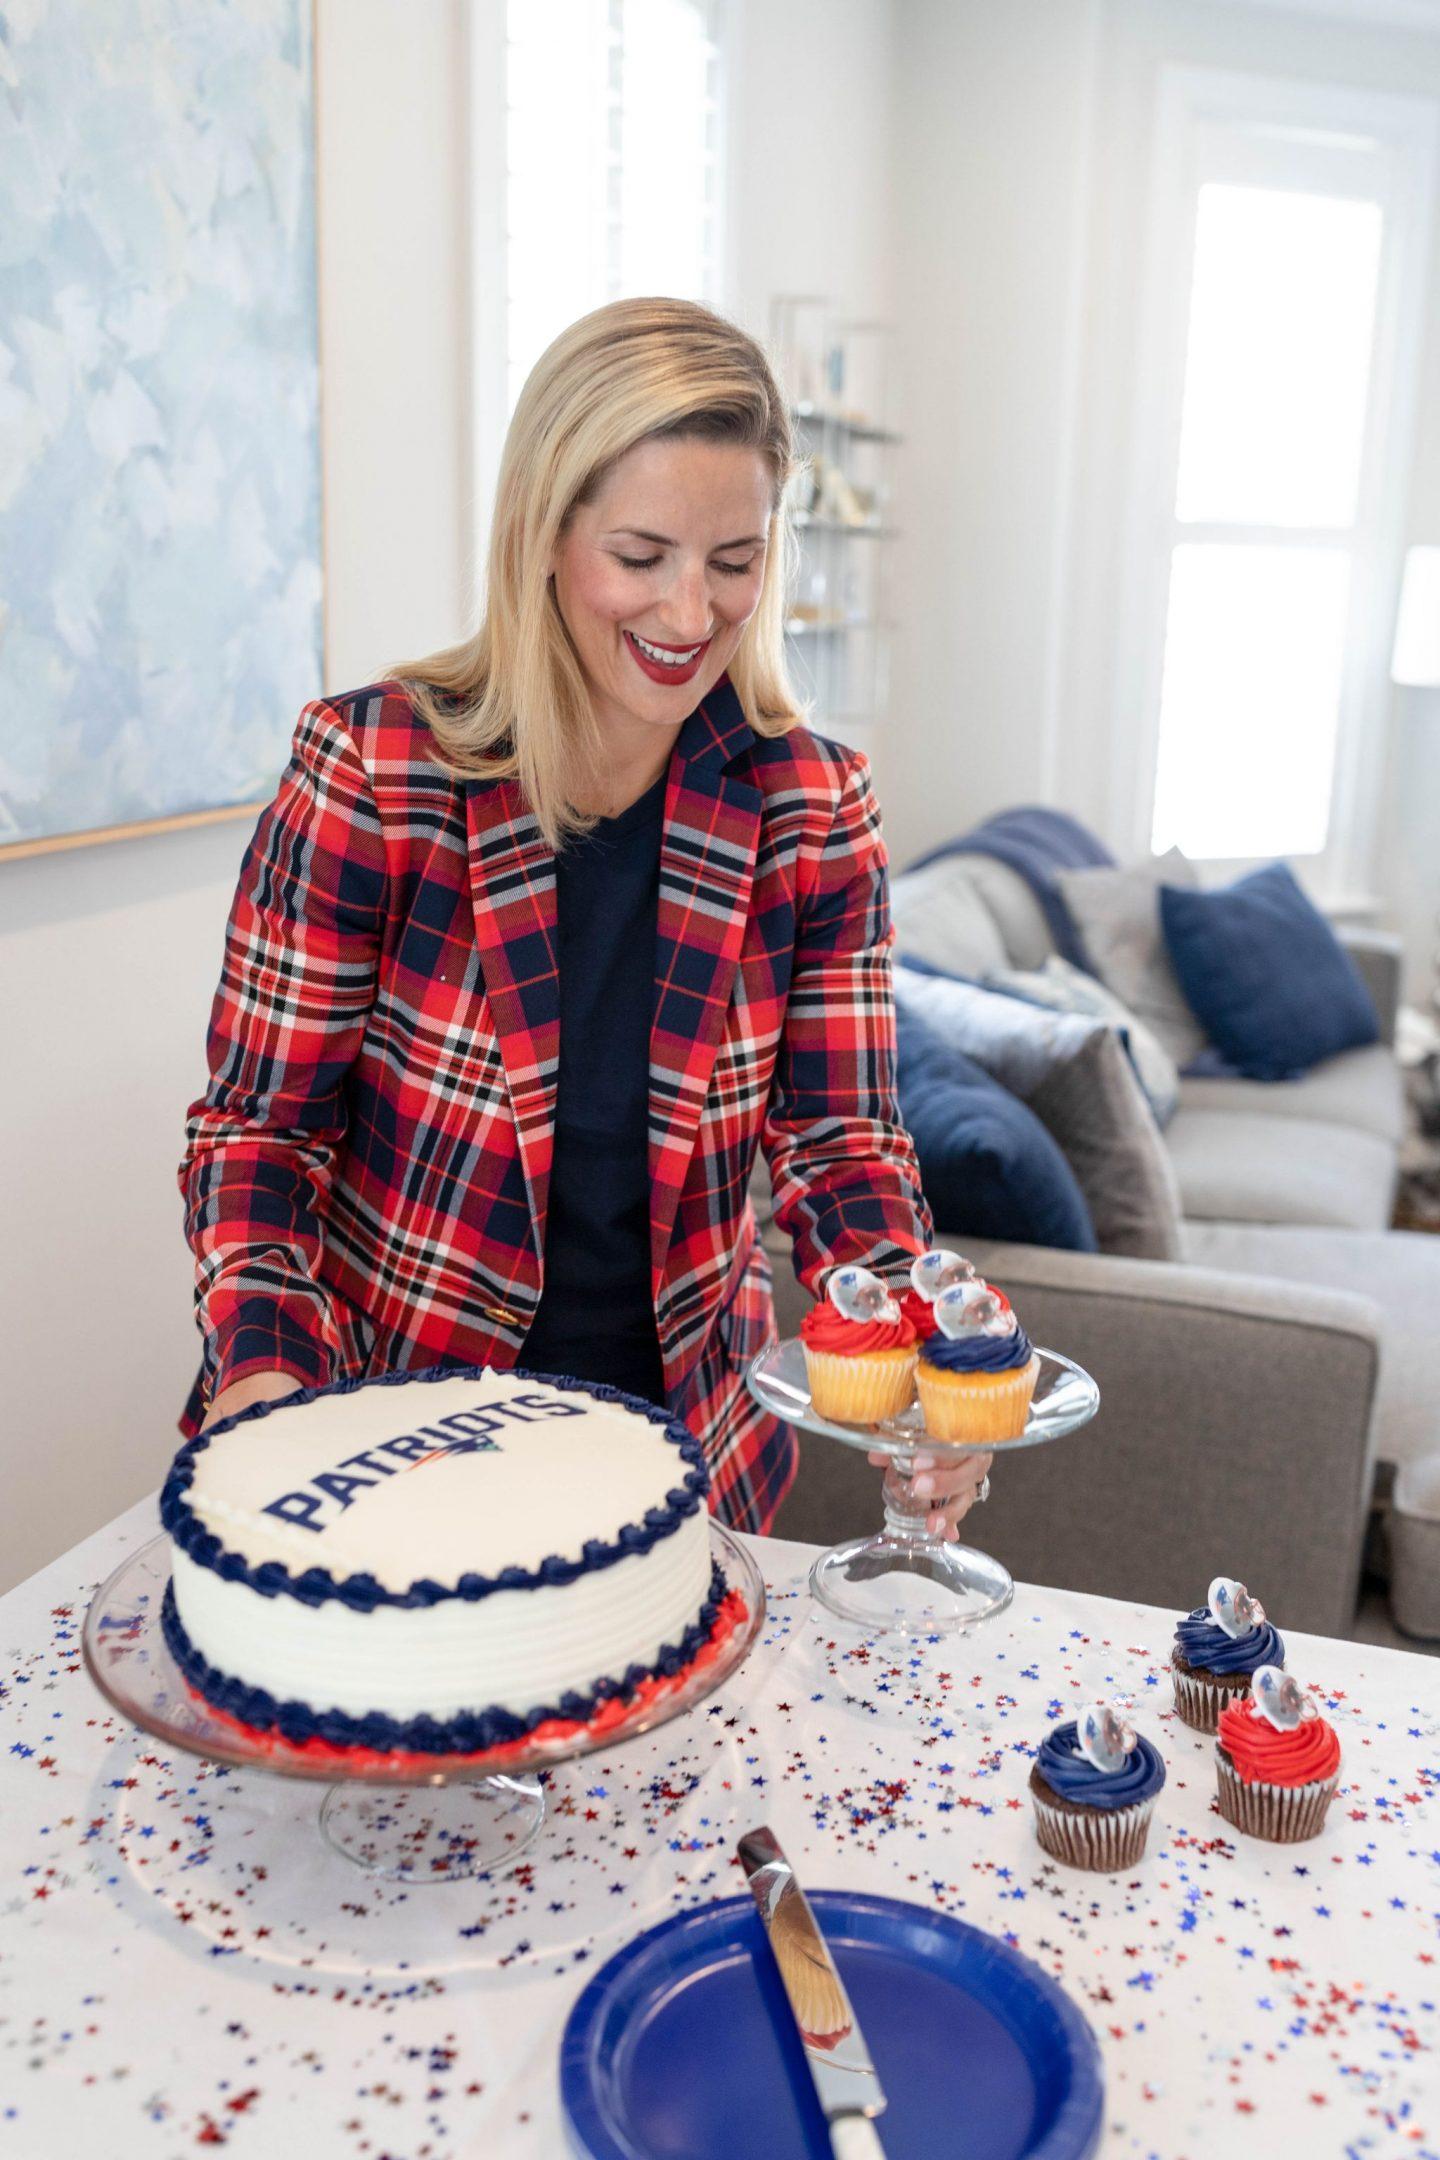 Super Bowl Party Recipe Ideas and Entertaining Essentials